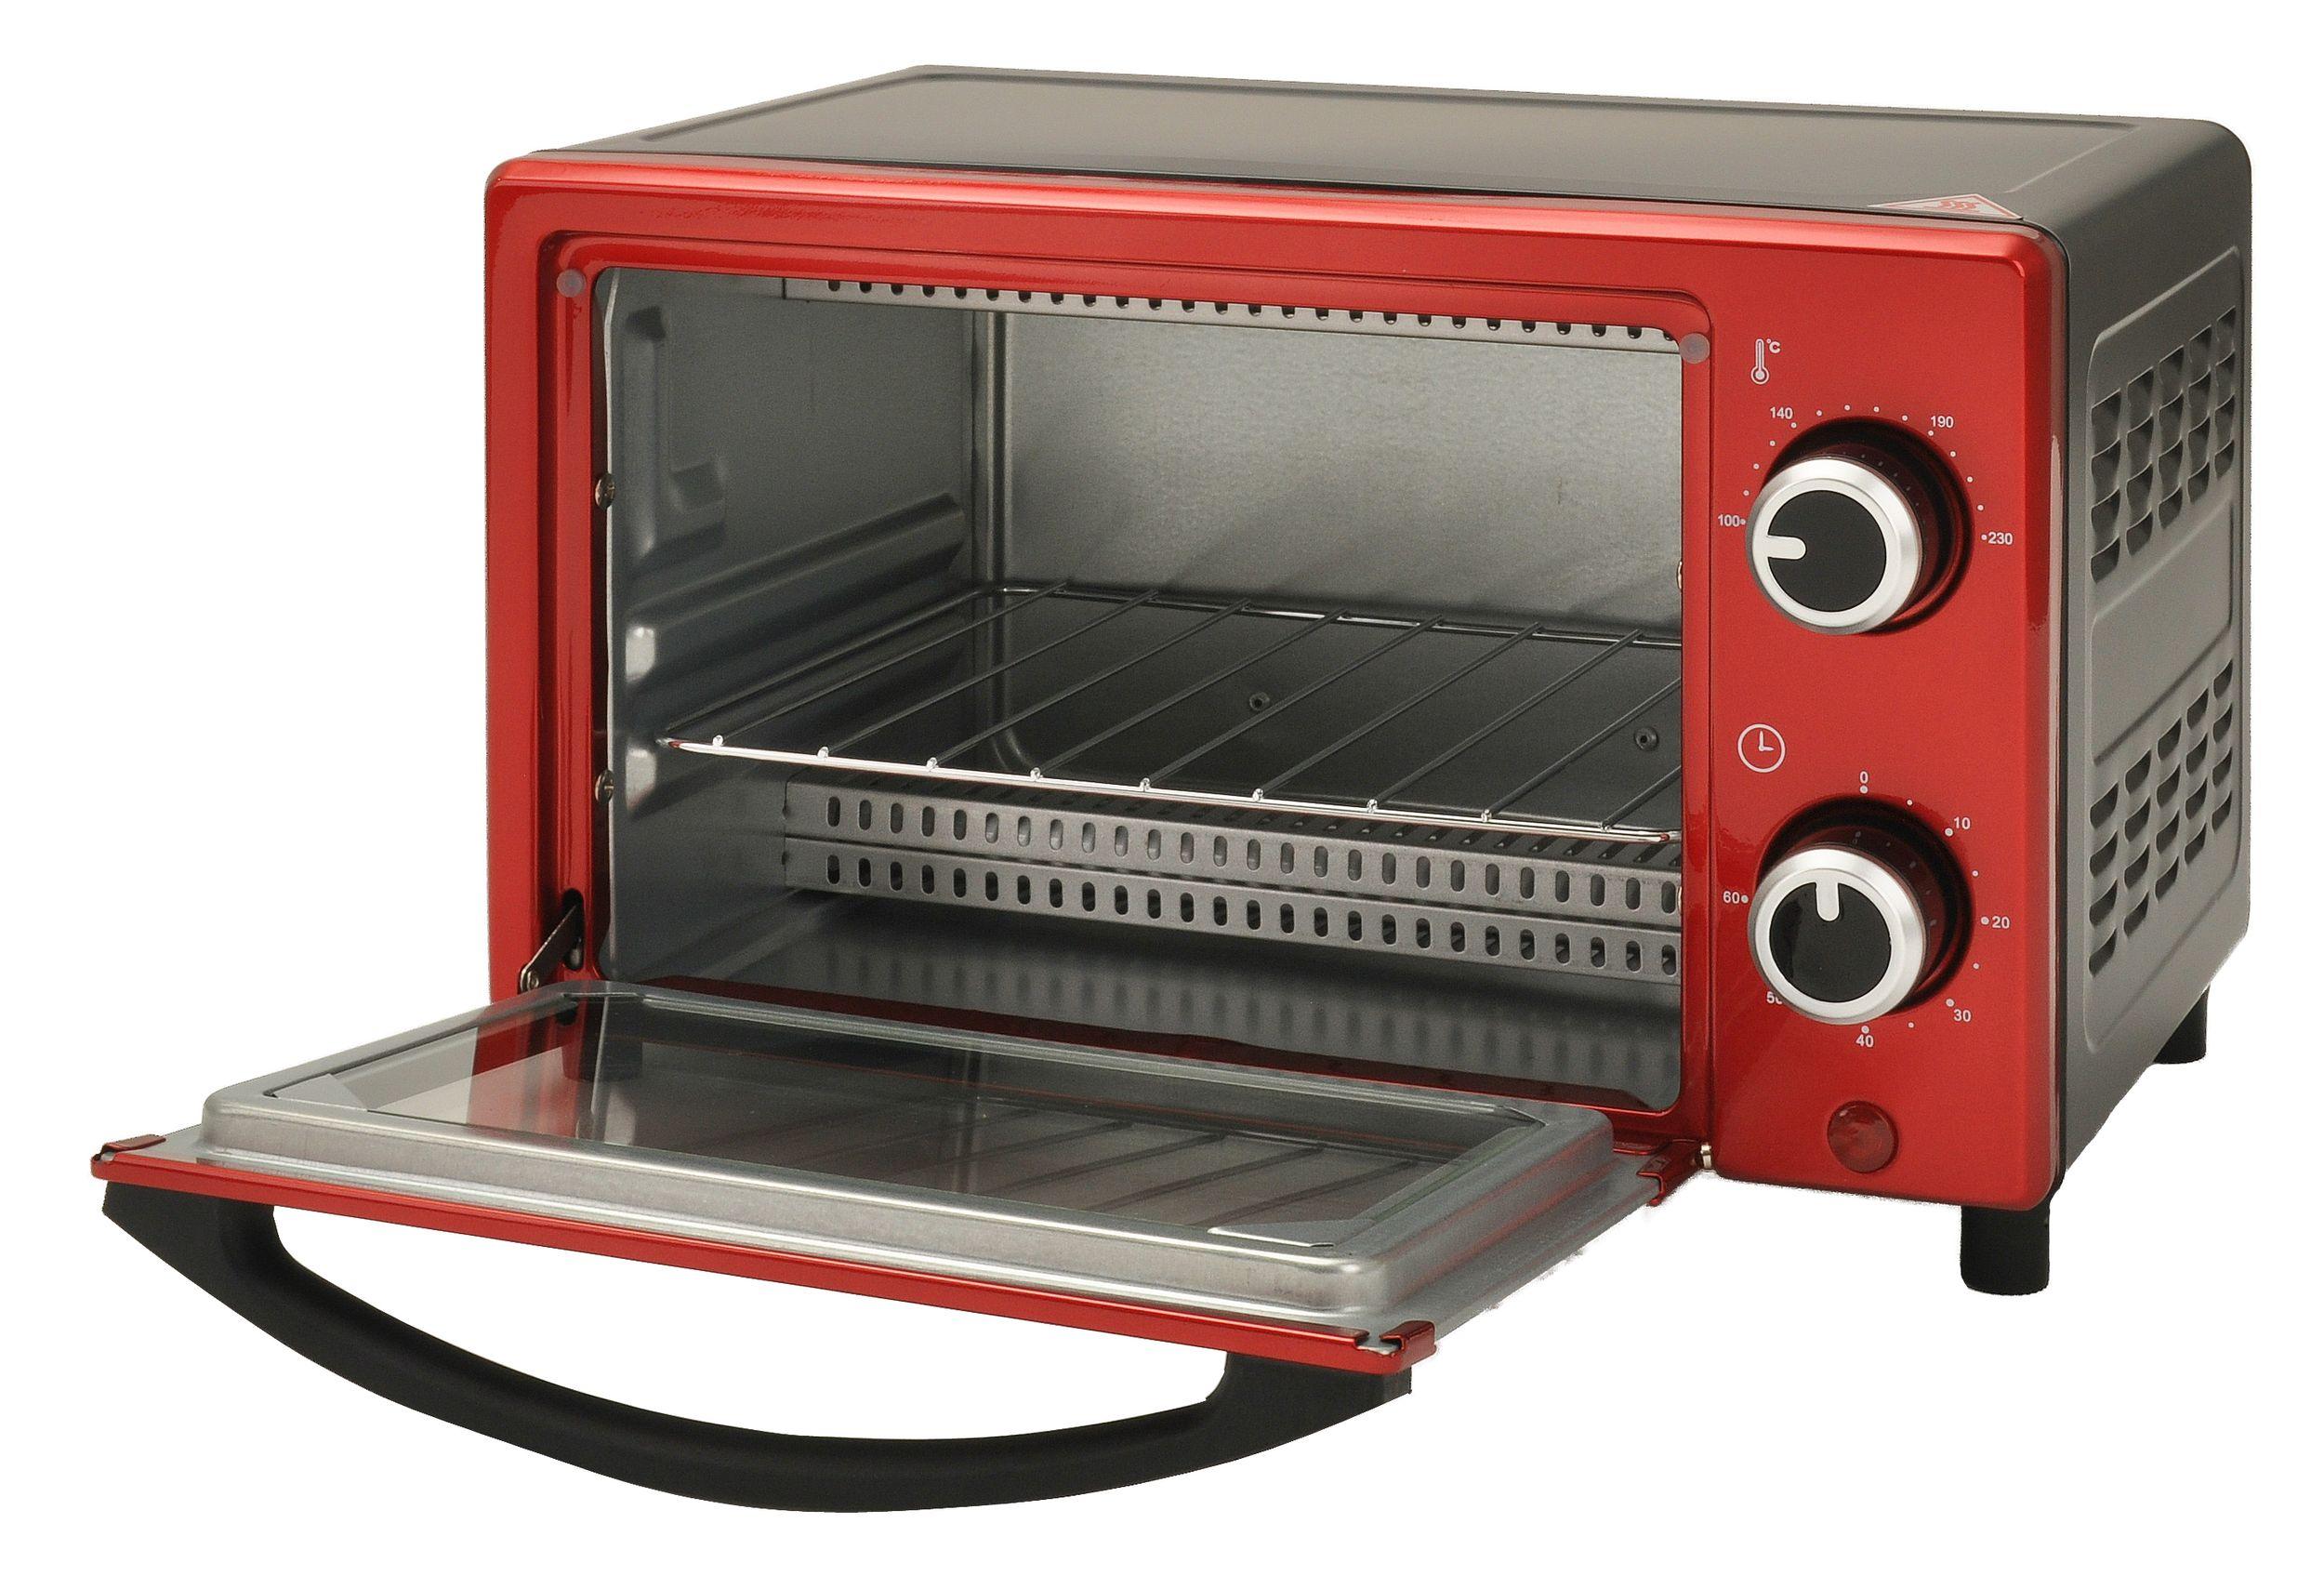 Multiofen 9L Mini-Ofen 60min Timer 230°C Backblech Grillrost 900W NEU*43529 Bild 2